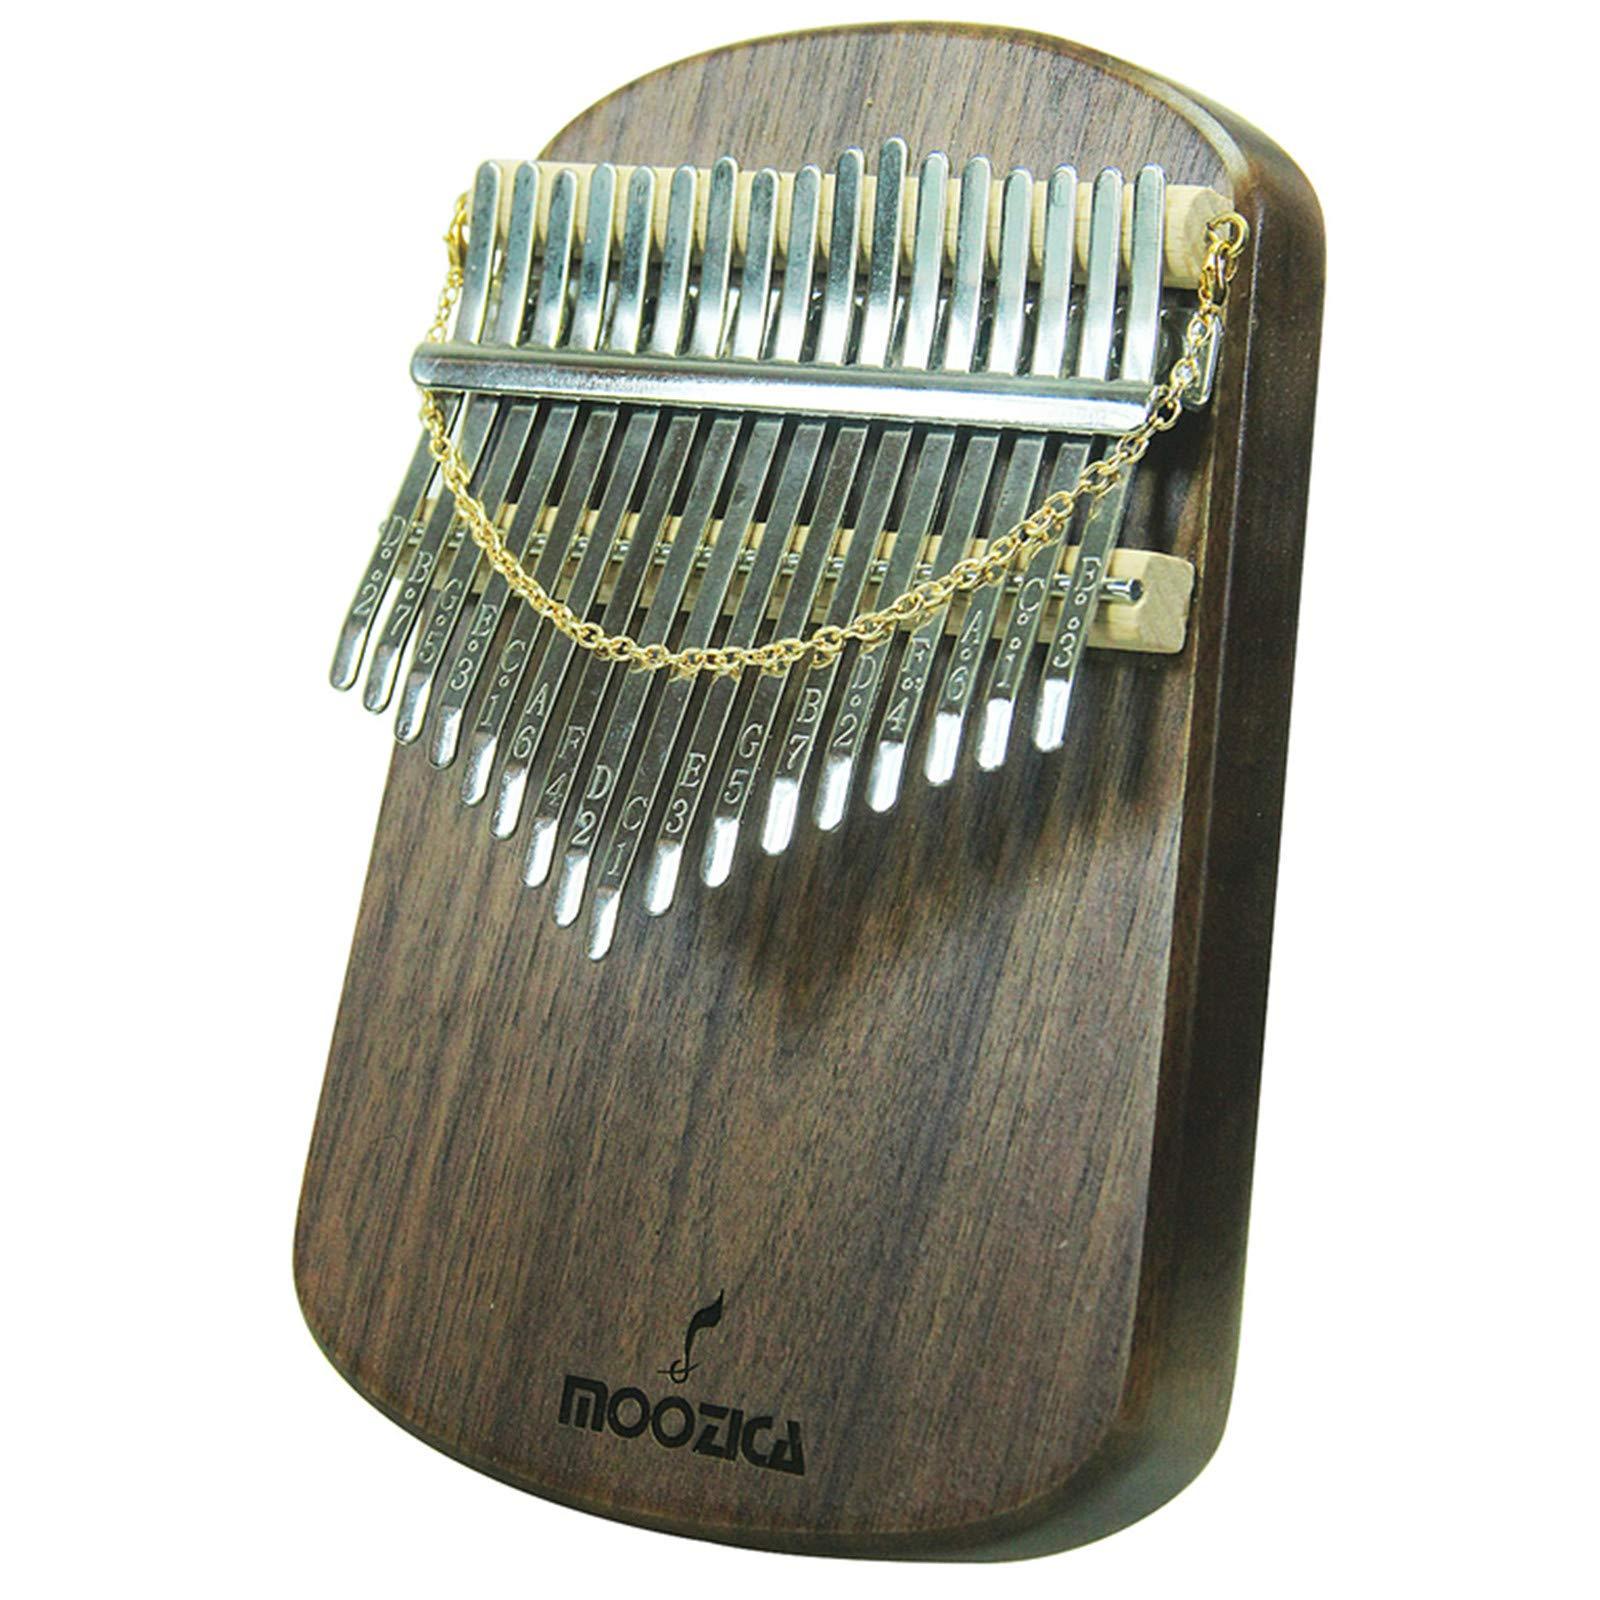 Moozica Kalimba 17 Keys Solid Walnut Wood Kalimba, Solid Walnut Wood Single Board Thumb Piano Marimba with Learning Instruction(K17S-W) by Moozica (Image #3)